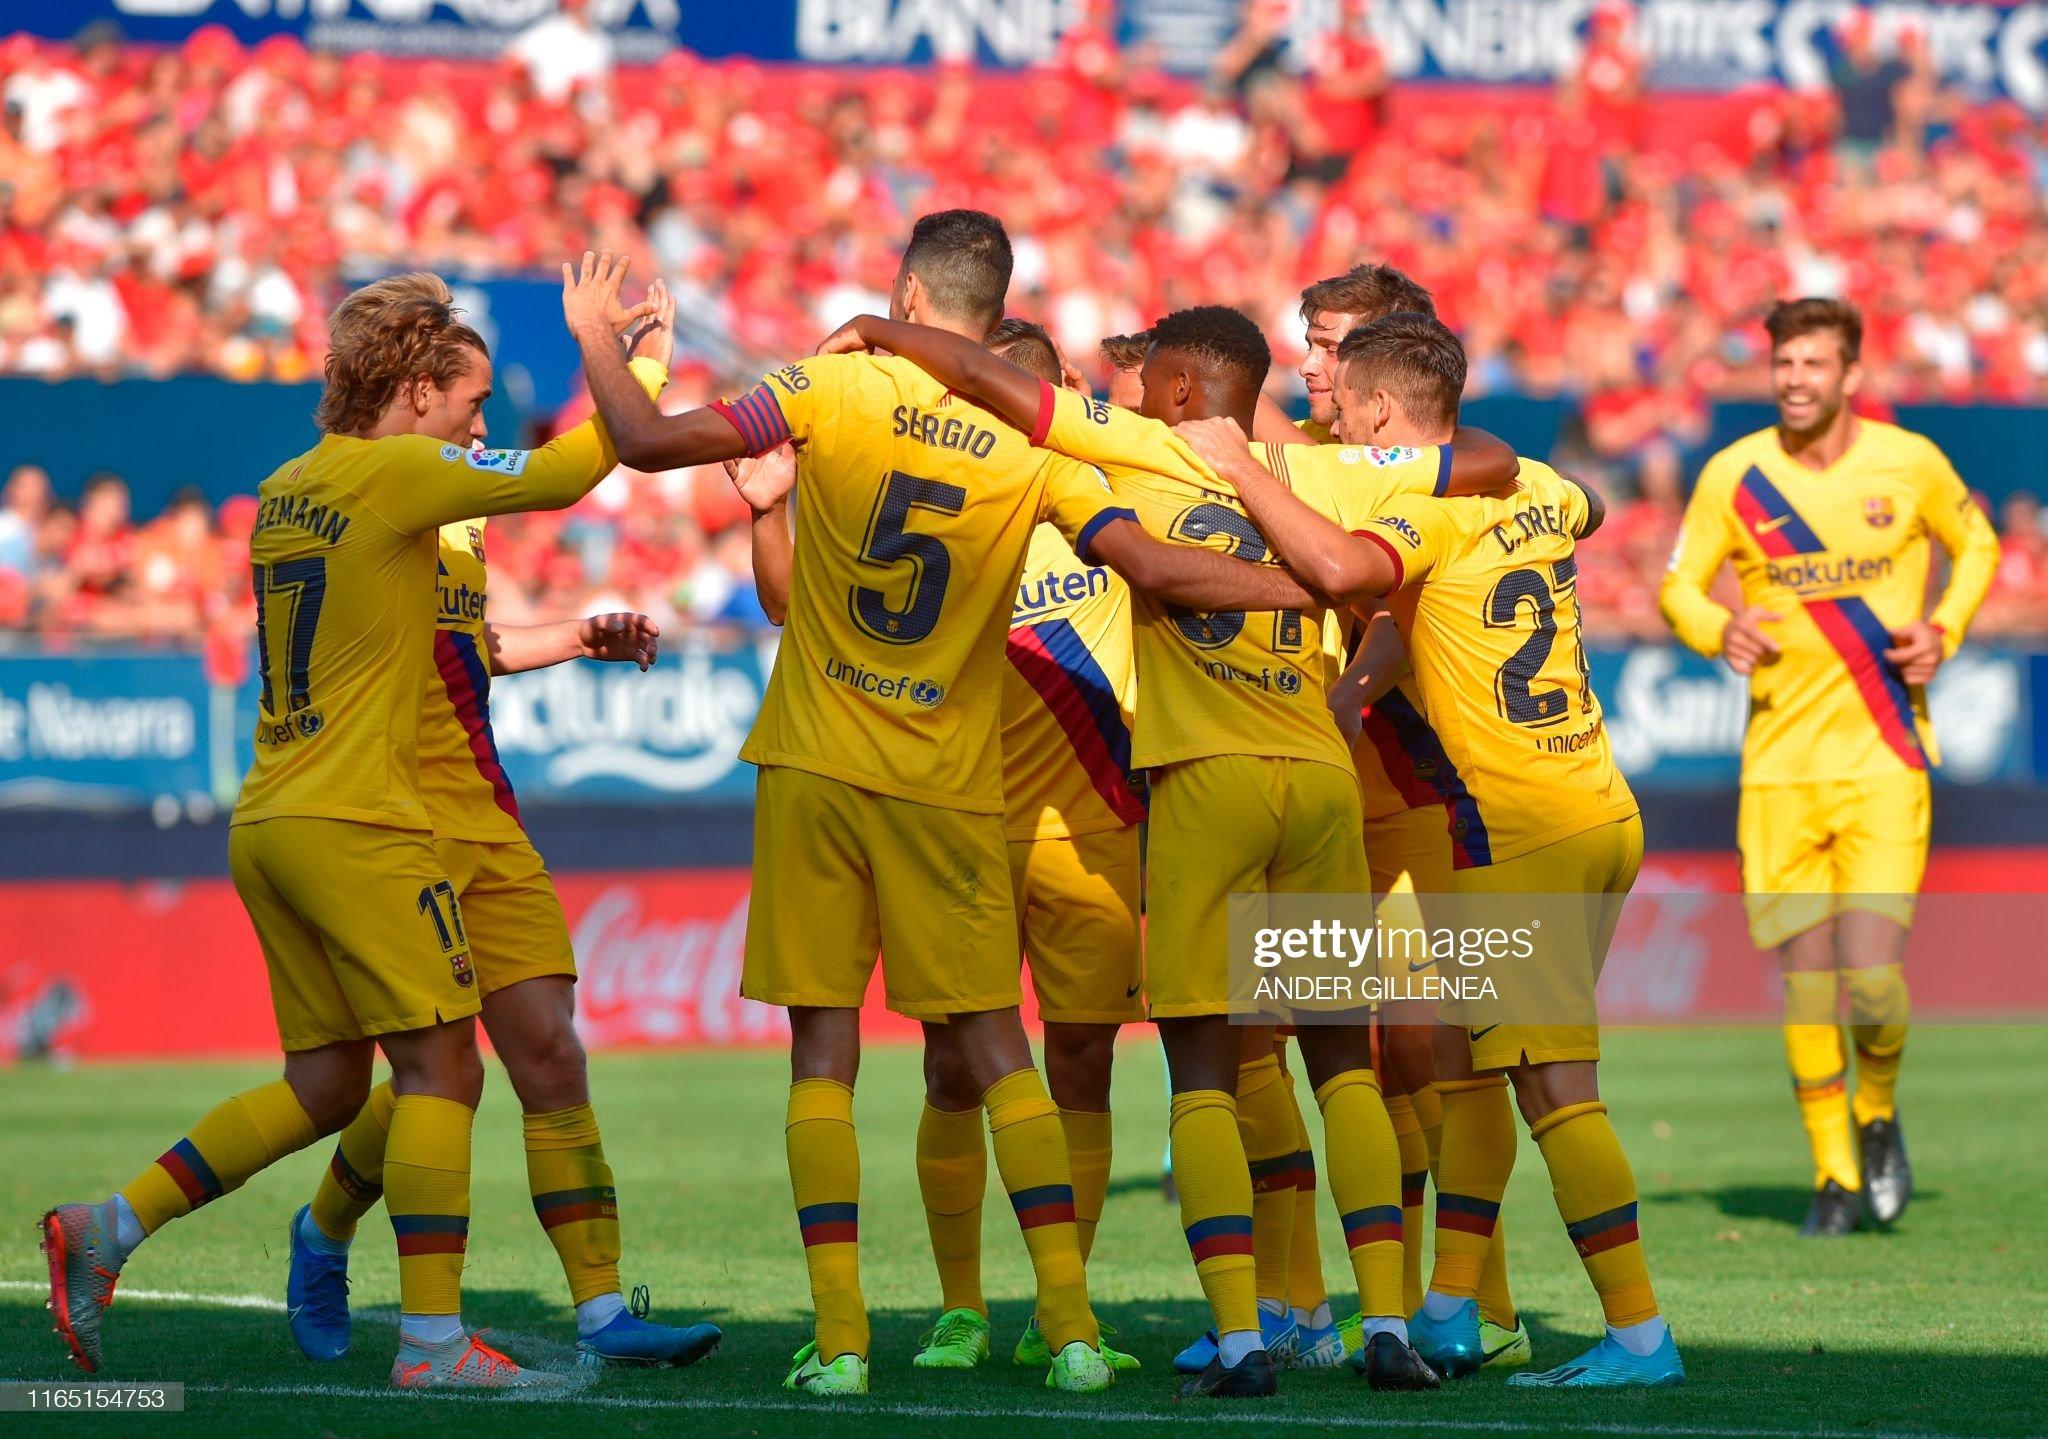 صور مباراة : أوساسونا - برشلونة 2-2 ( 31-08-2019 )  Barcelonas-players-celebrate-after-barcelonas-brazilian-midfielder-picture-id1165154753?s=2048x2048